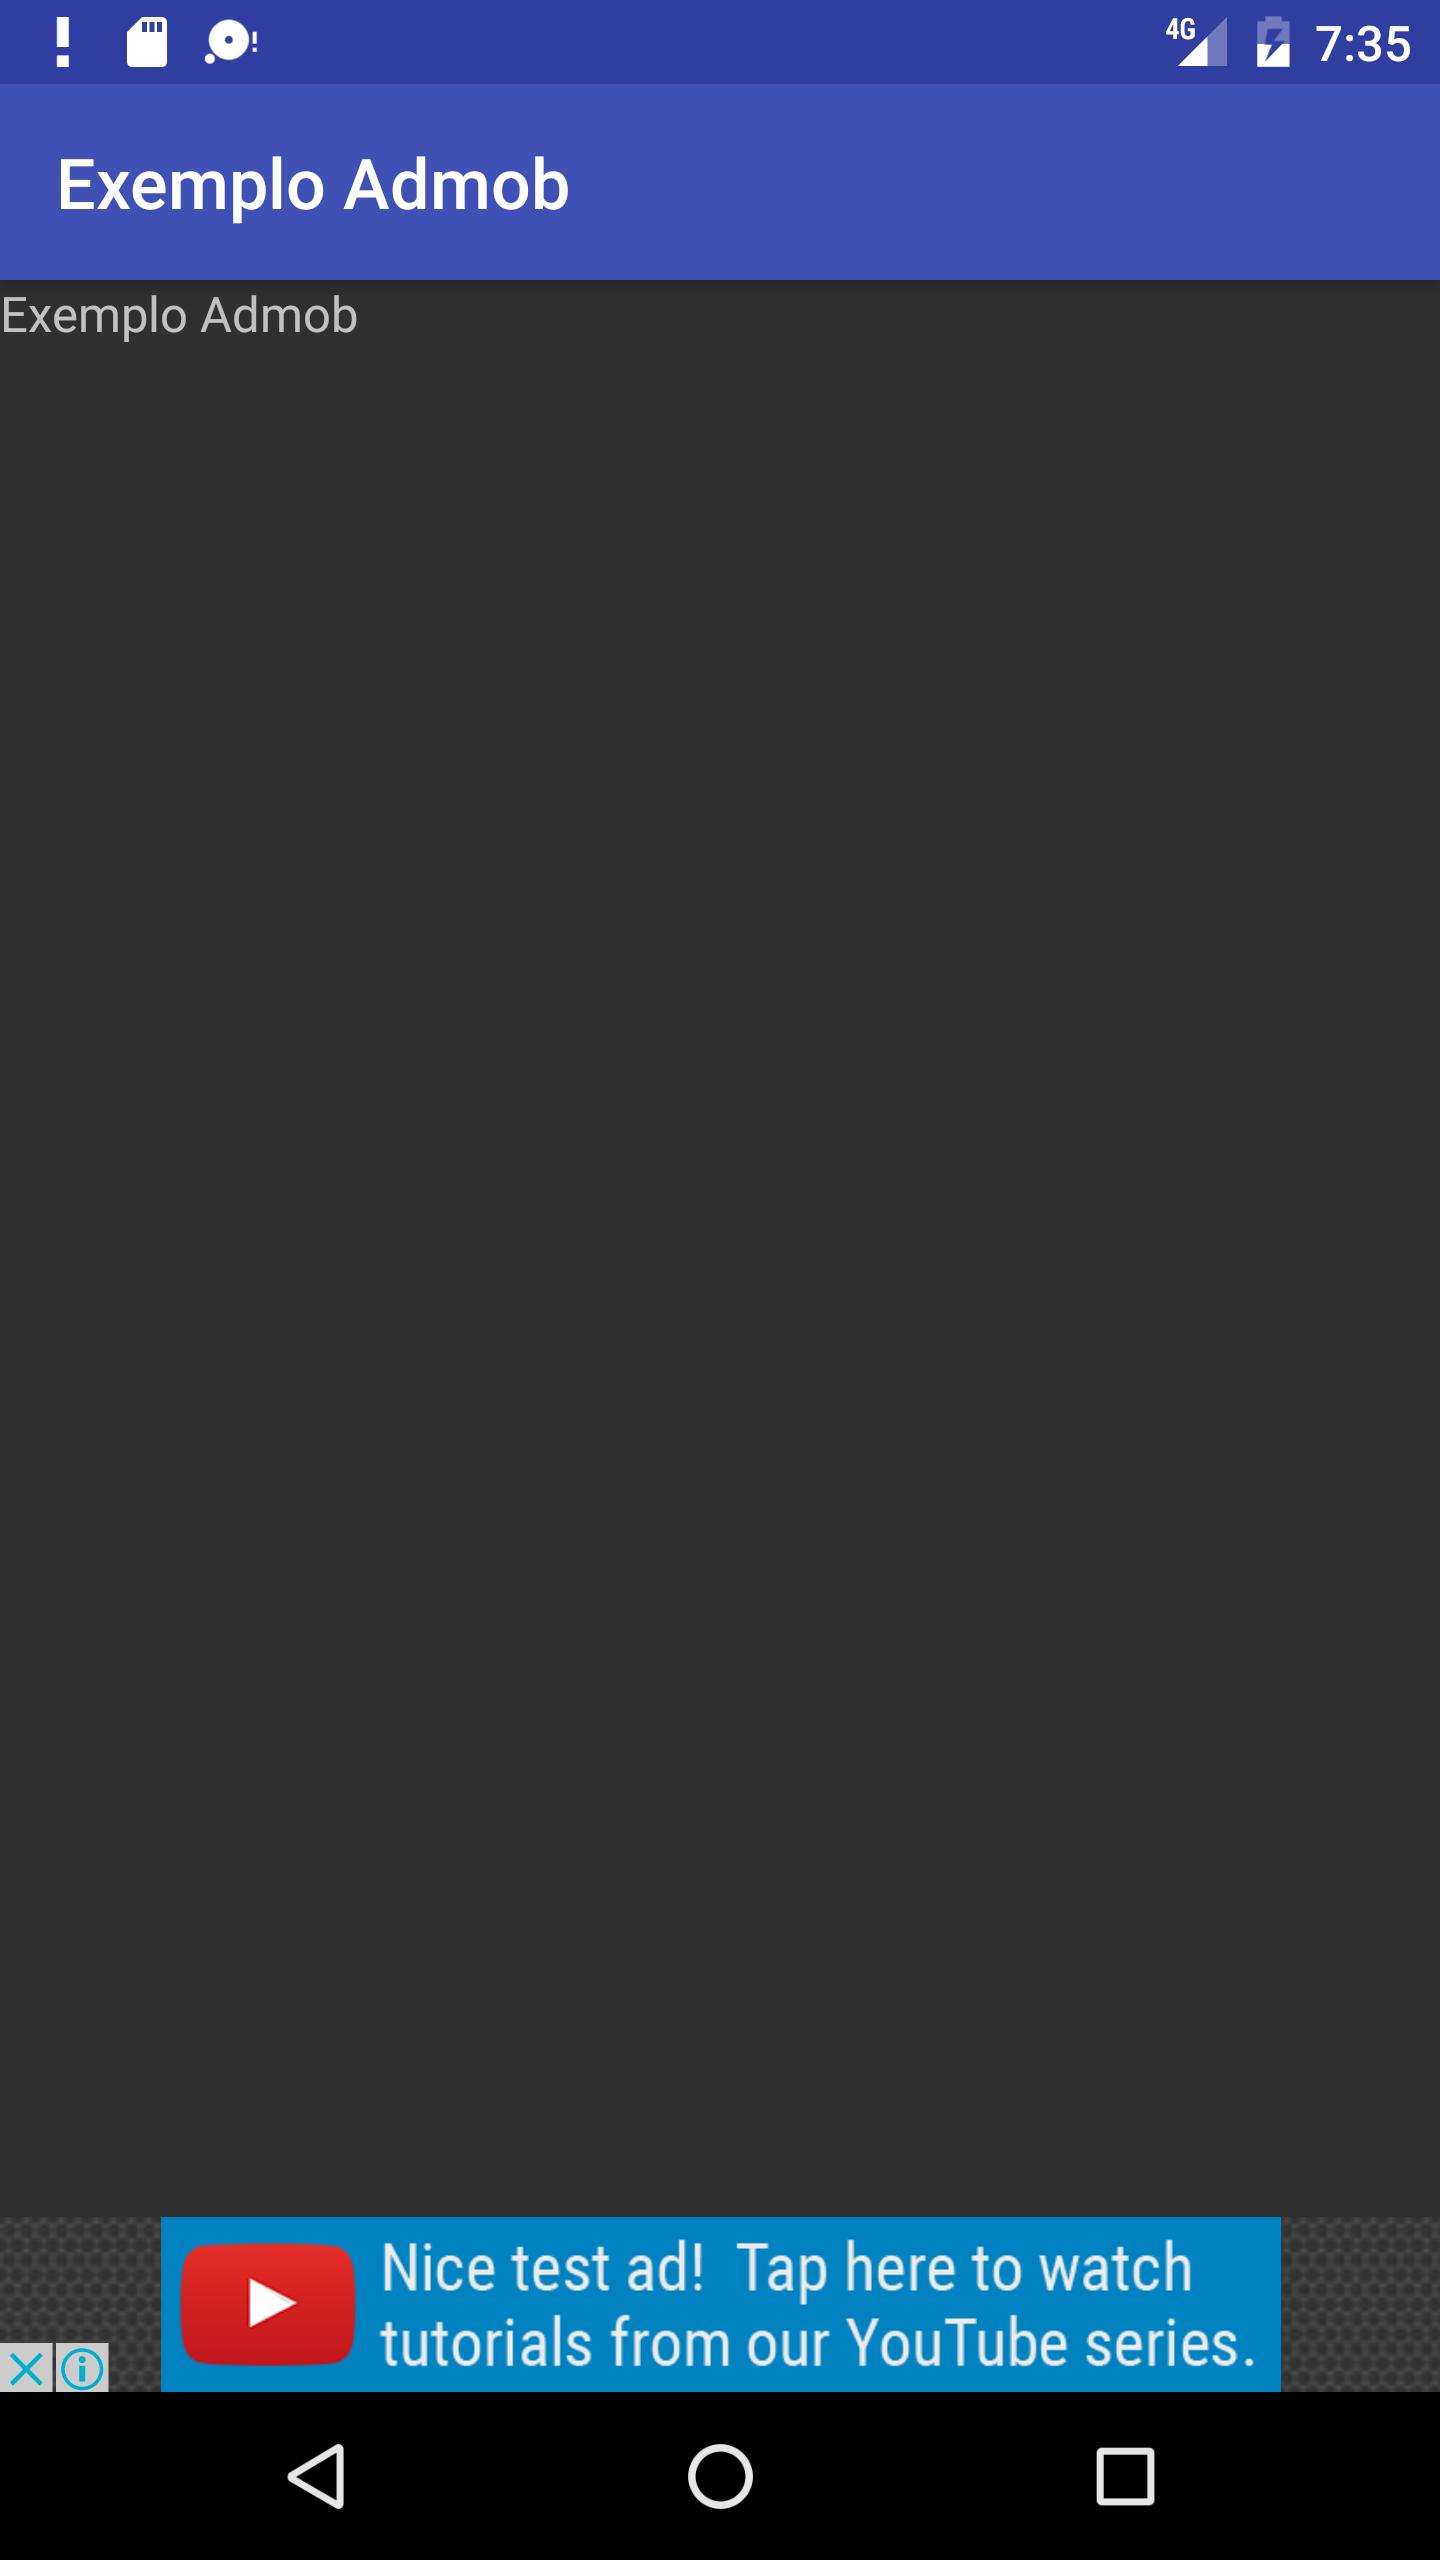 exemplo admob tela